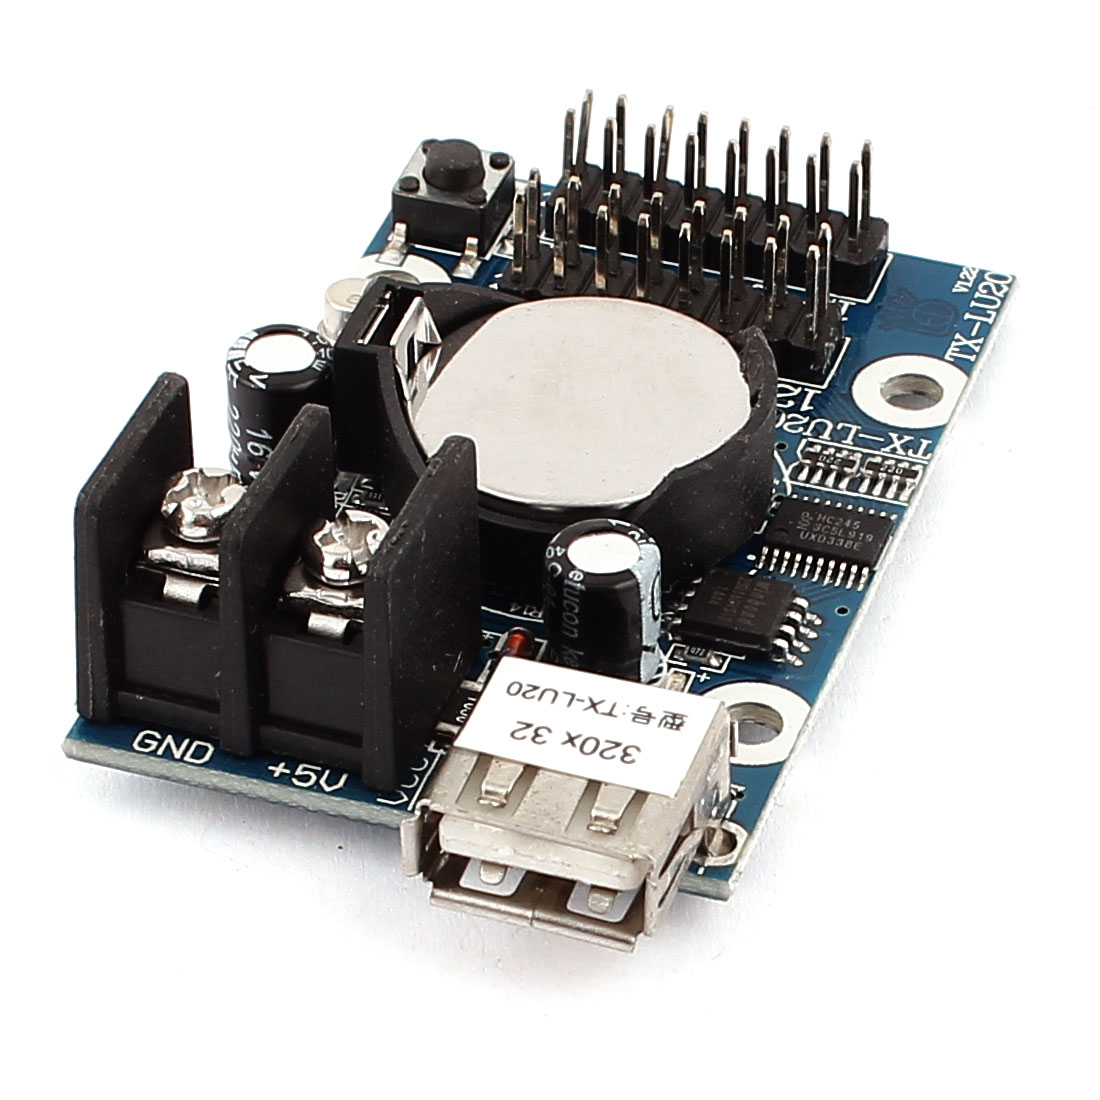 TX-LU20 USB Port U-disk LED Screen Display Control Card P10 Module